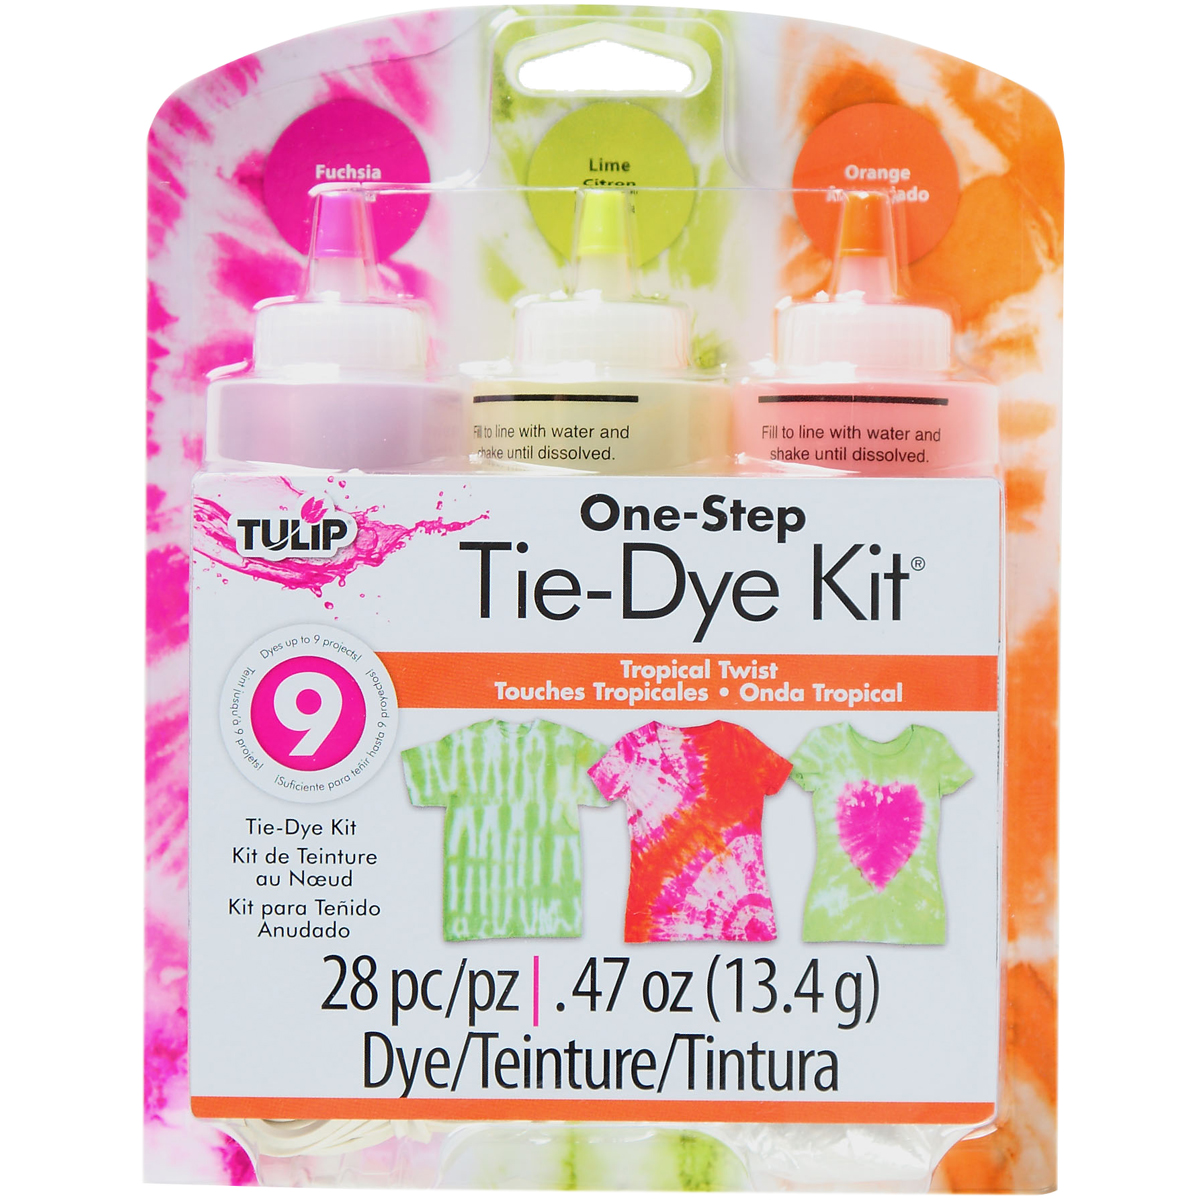 Tulip One-Step Tie-Dye Kit - VARIOUS CHOICES!